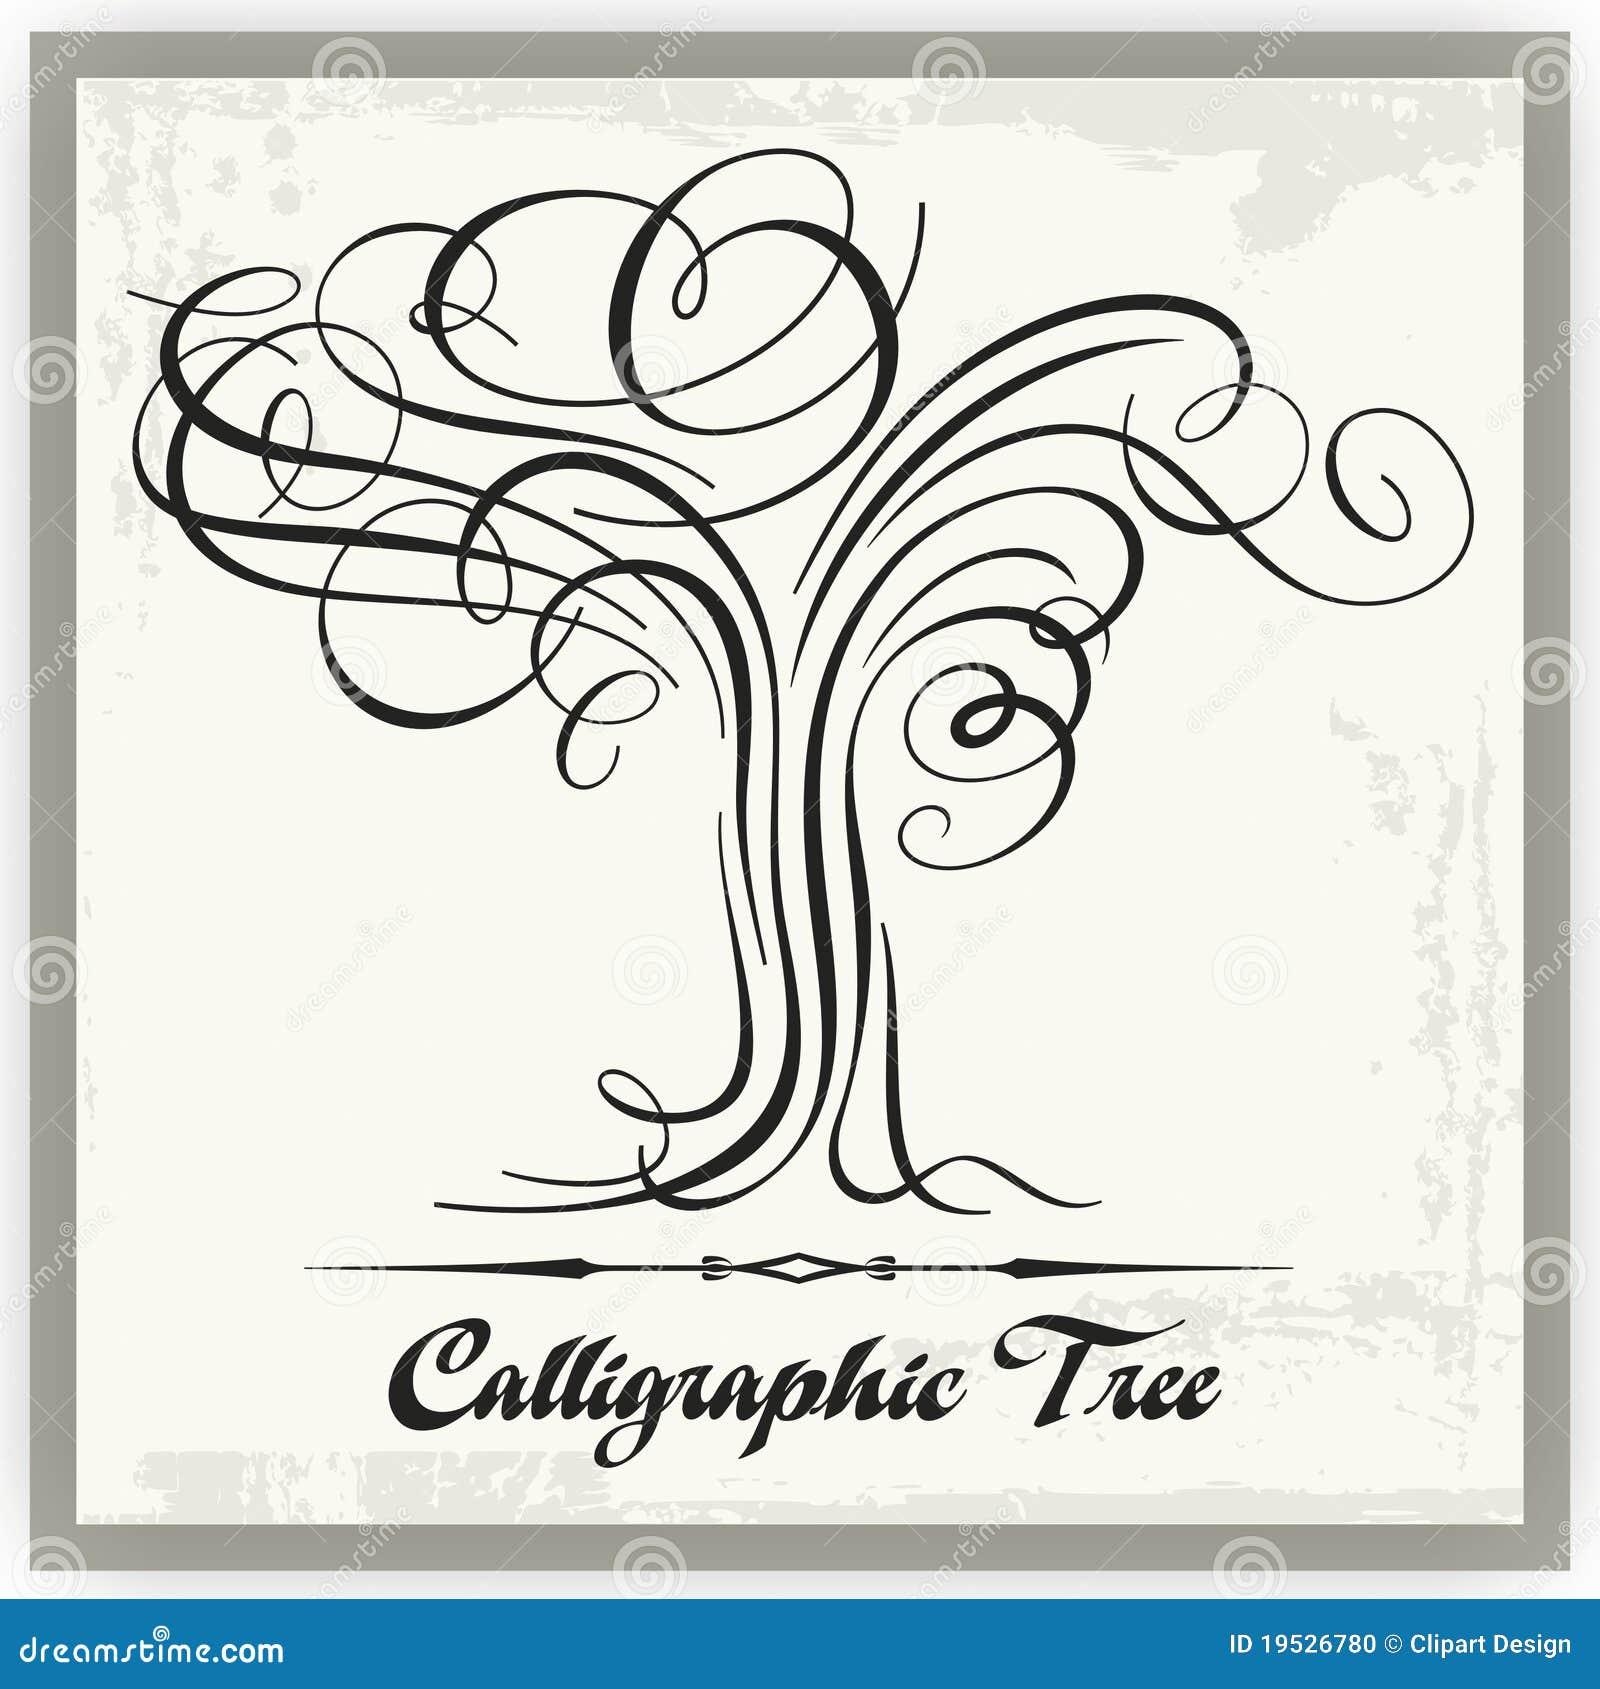 Calligraphic tree stock vector illustration of